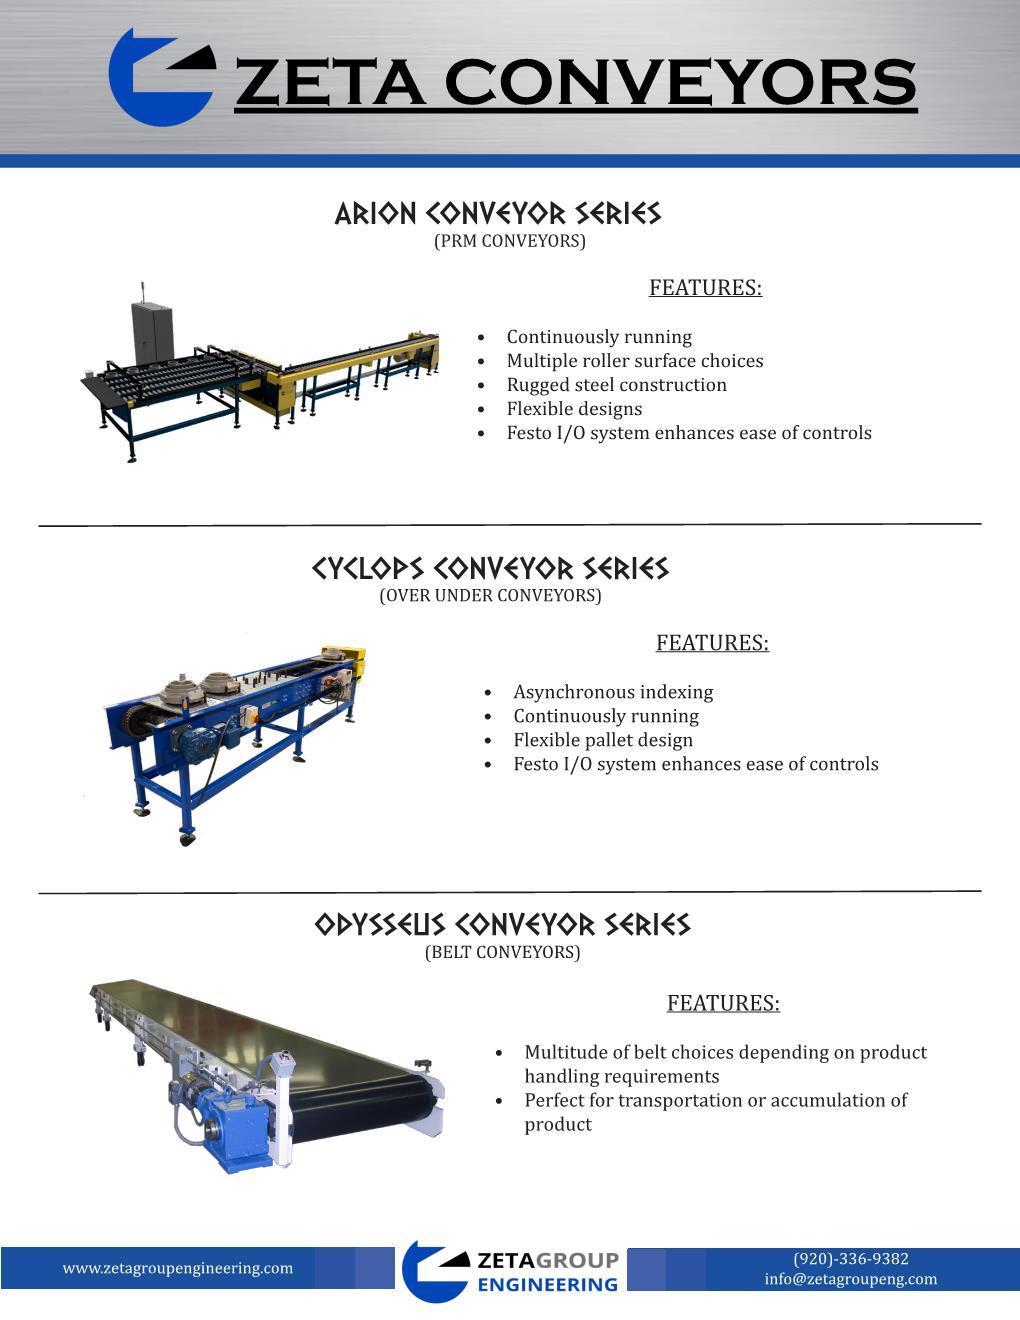 Zeta Conveyor Lineup Brochure